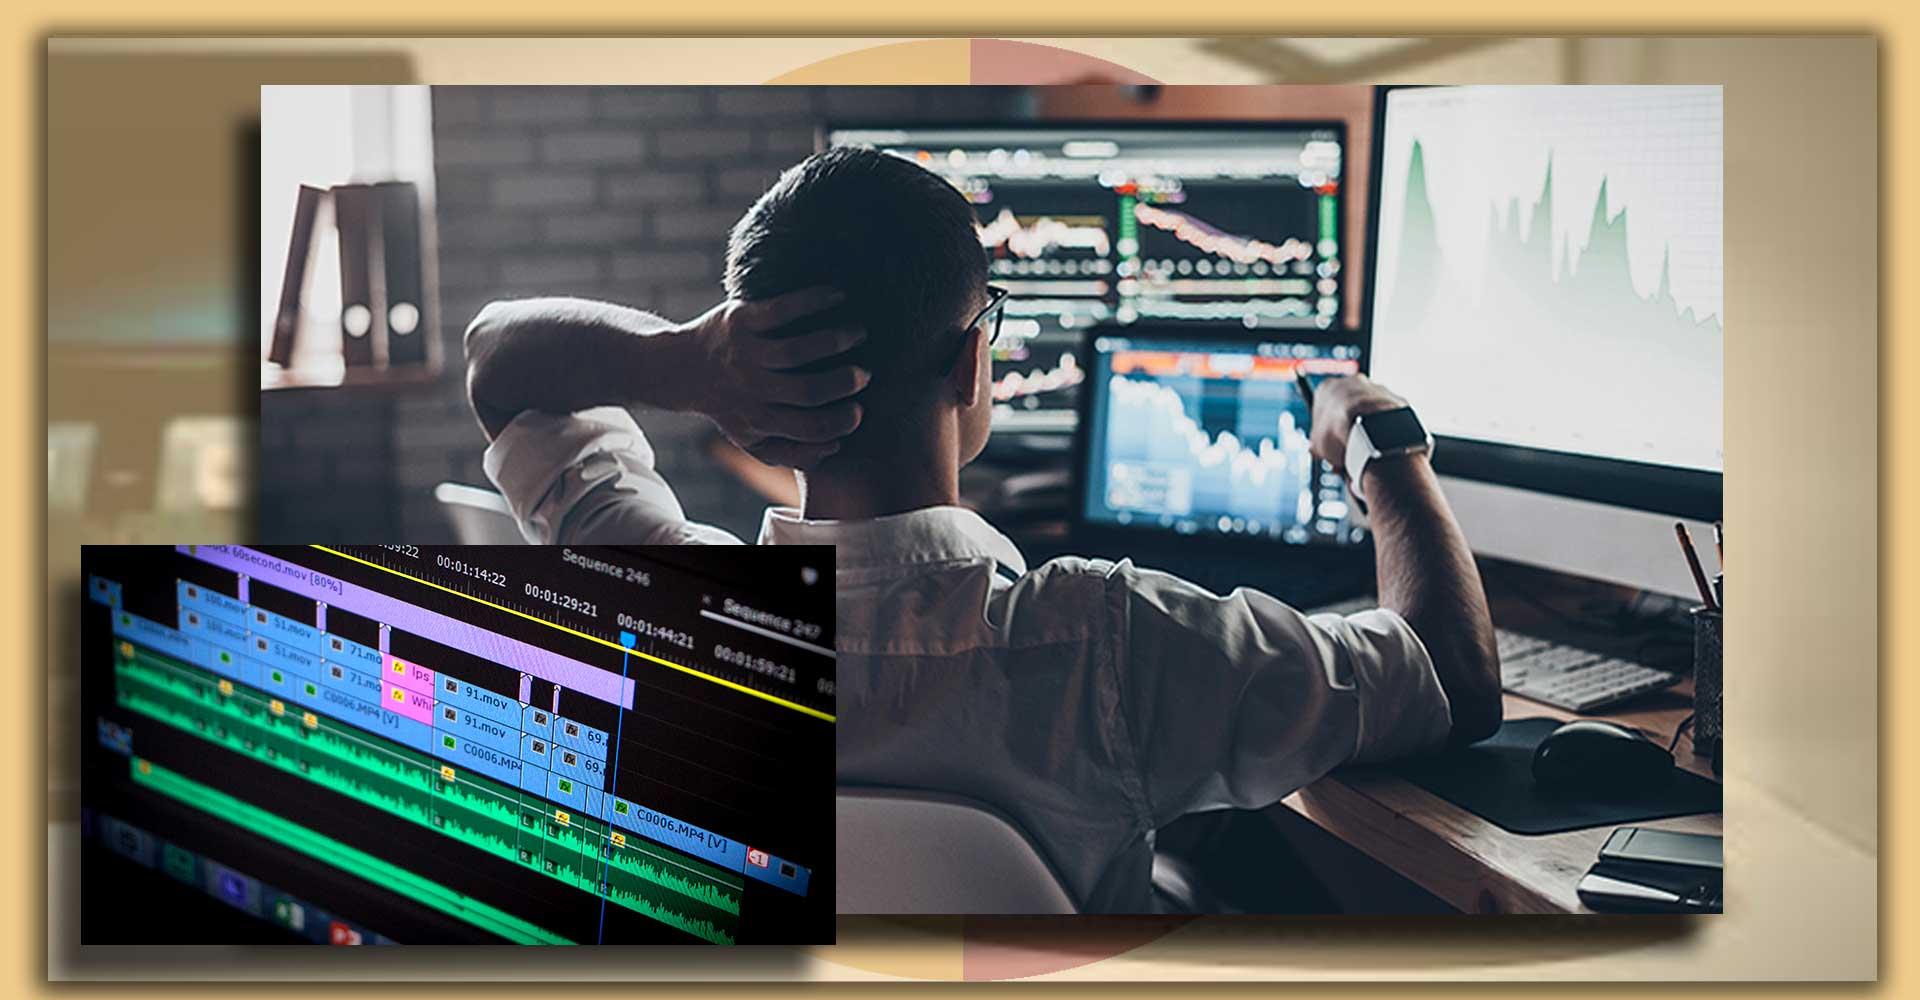 Video Editing best5 - چگونه تدوینگر شویم ؟ 5 روش